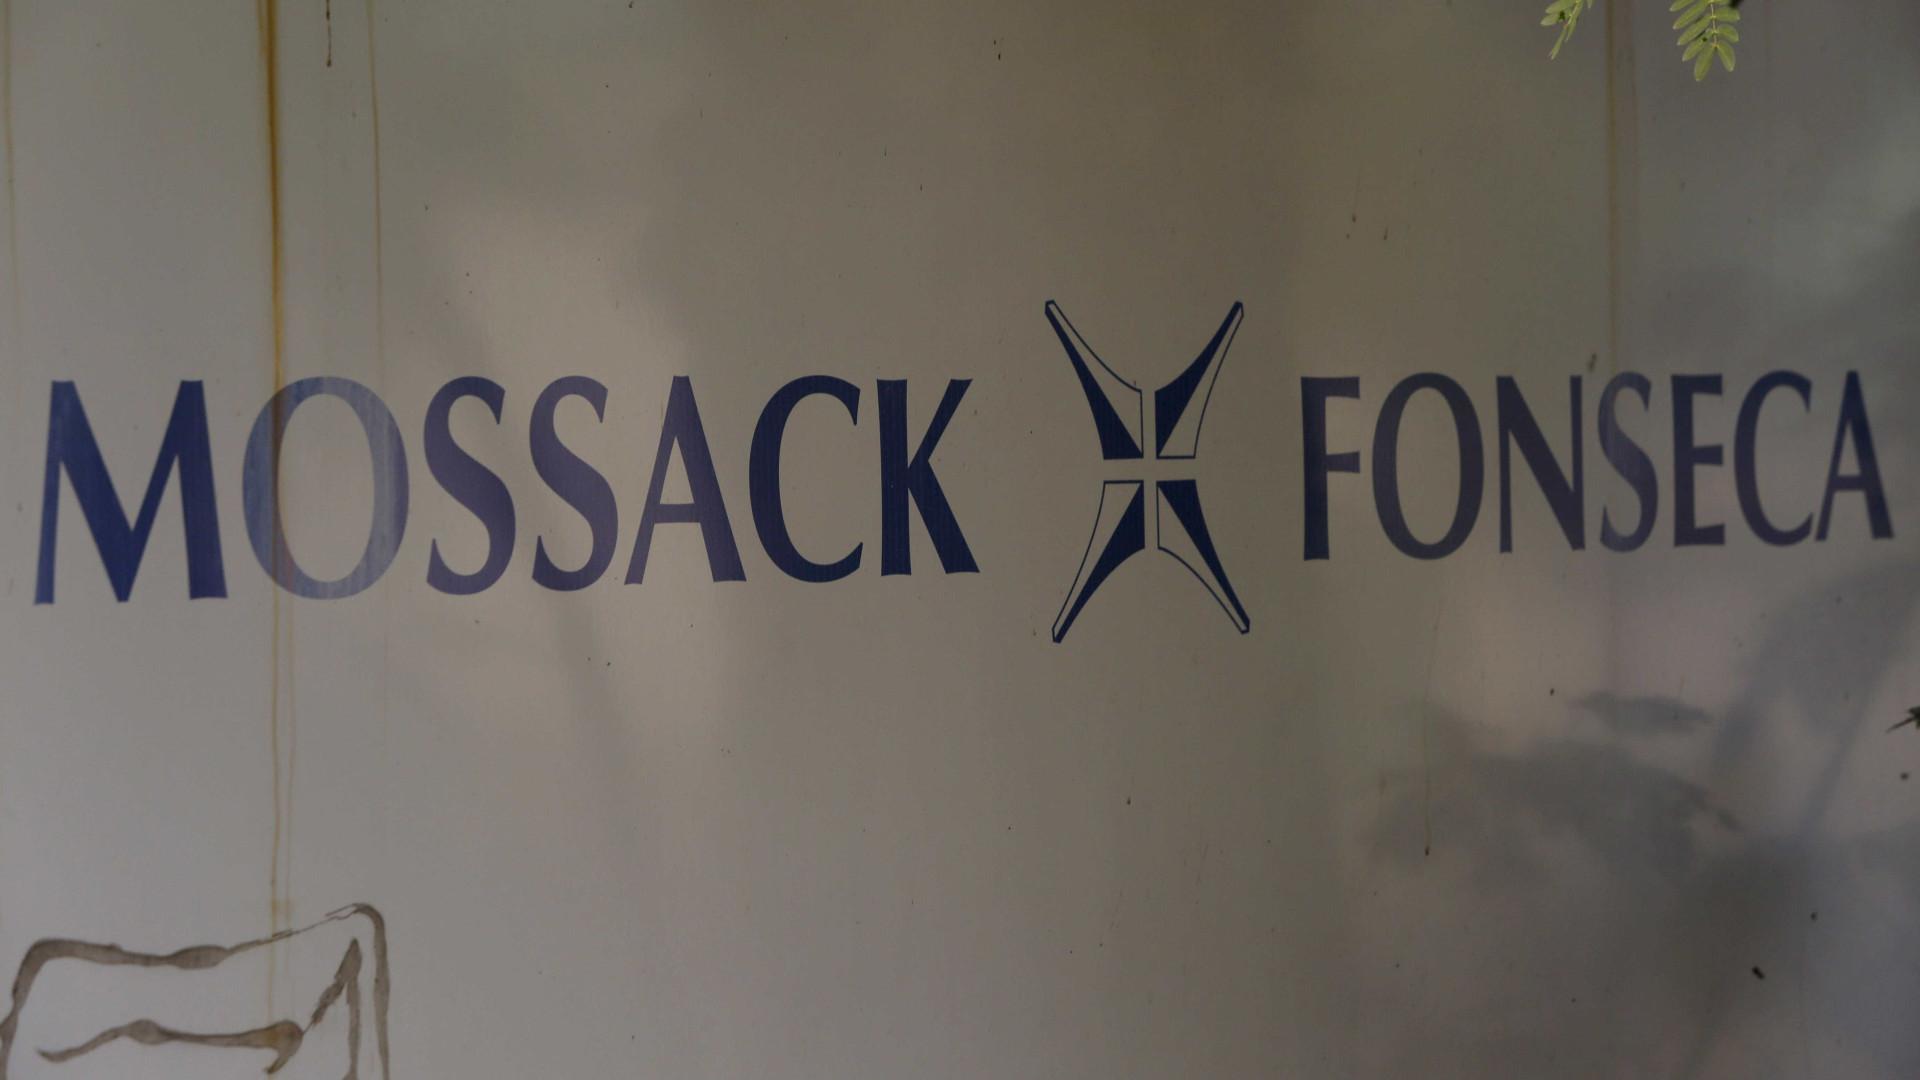 Advogado panamiano envolvido nos casos Mossack Fonseca-Lava Jato detido